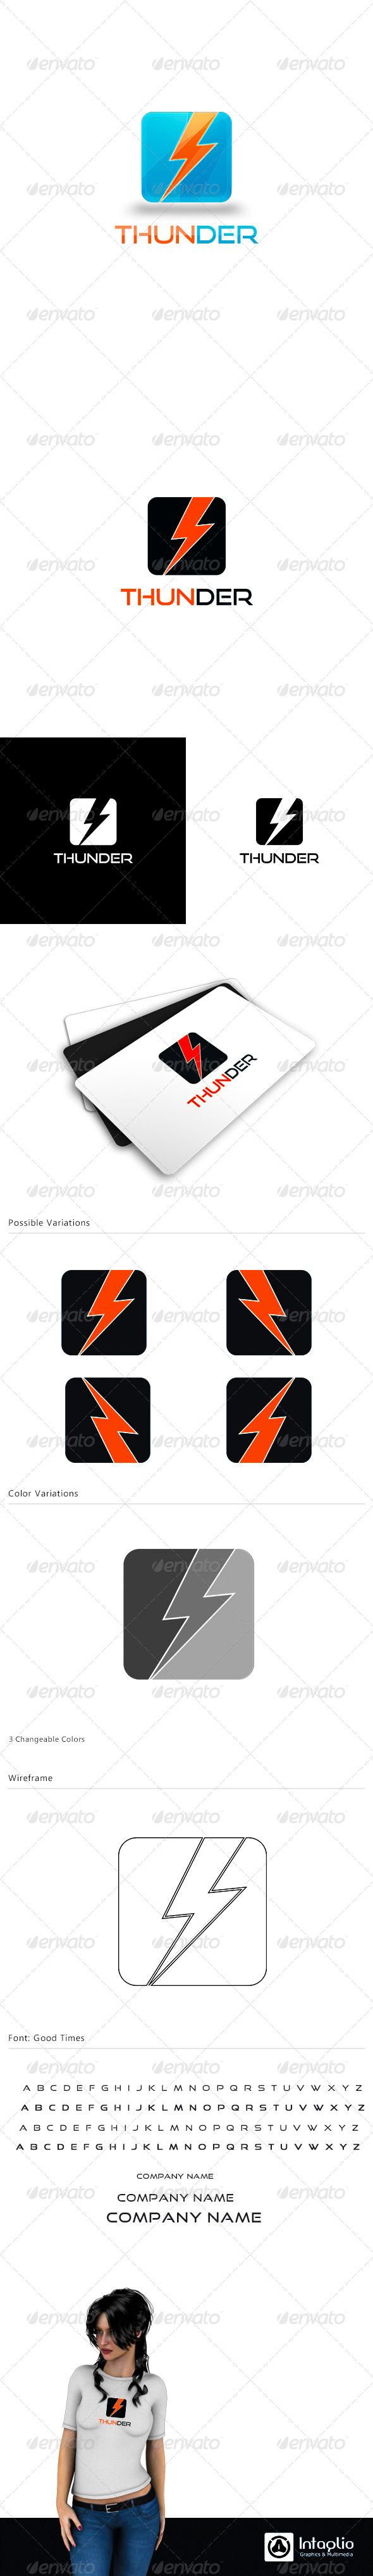 Creative Logo - Thunder - Symbols Logo Templates